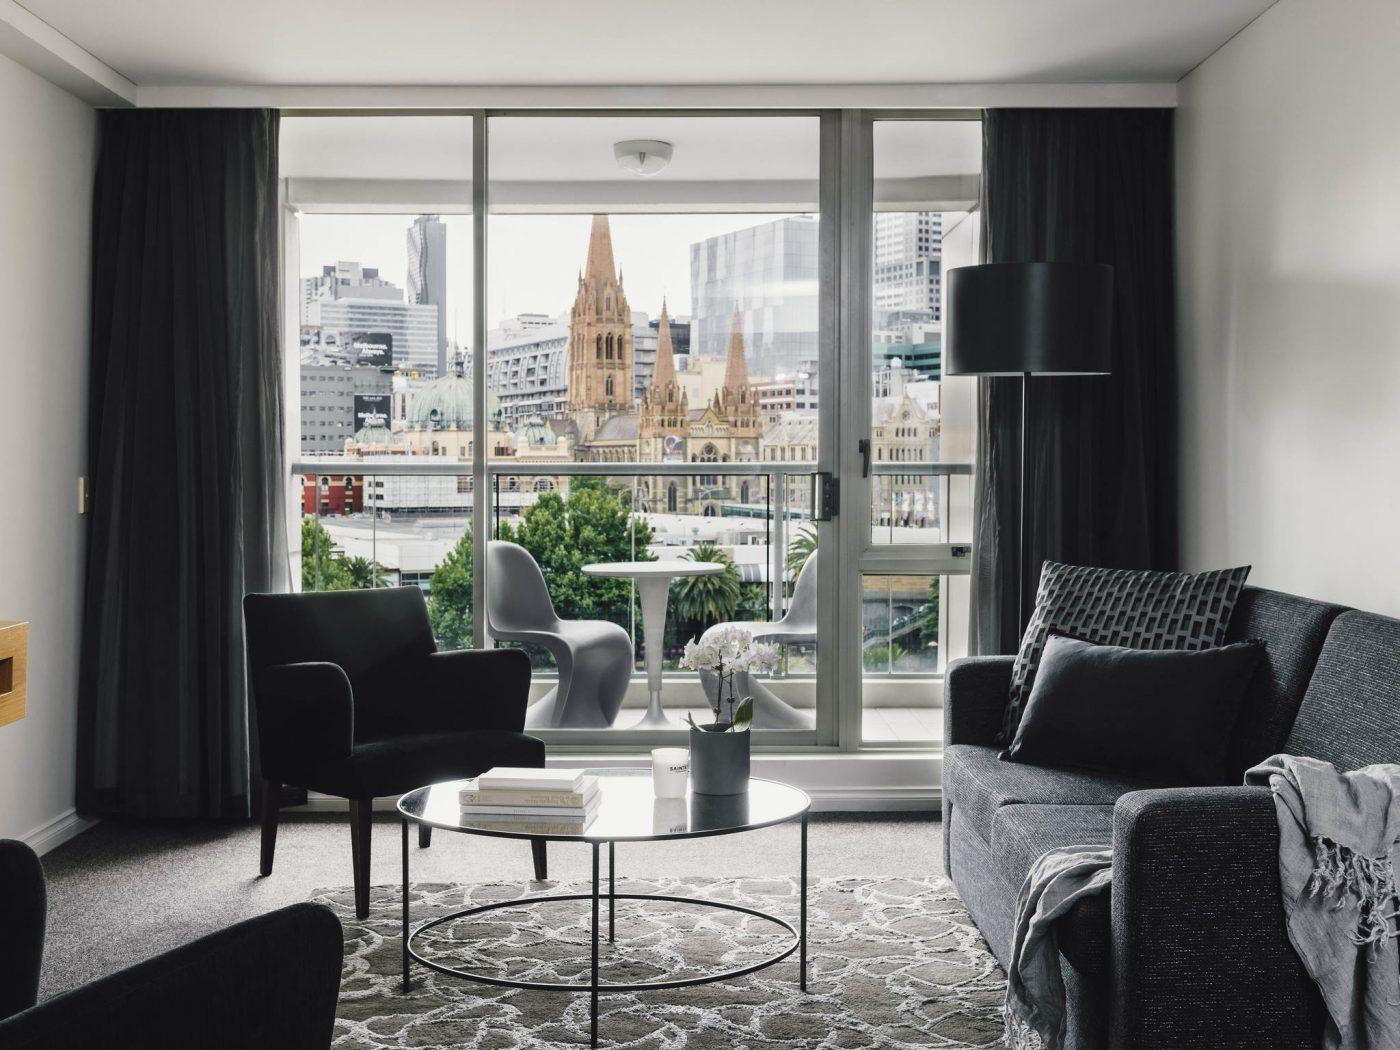 Where to stay in Melbourne Australia